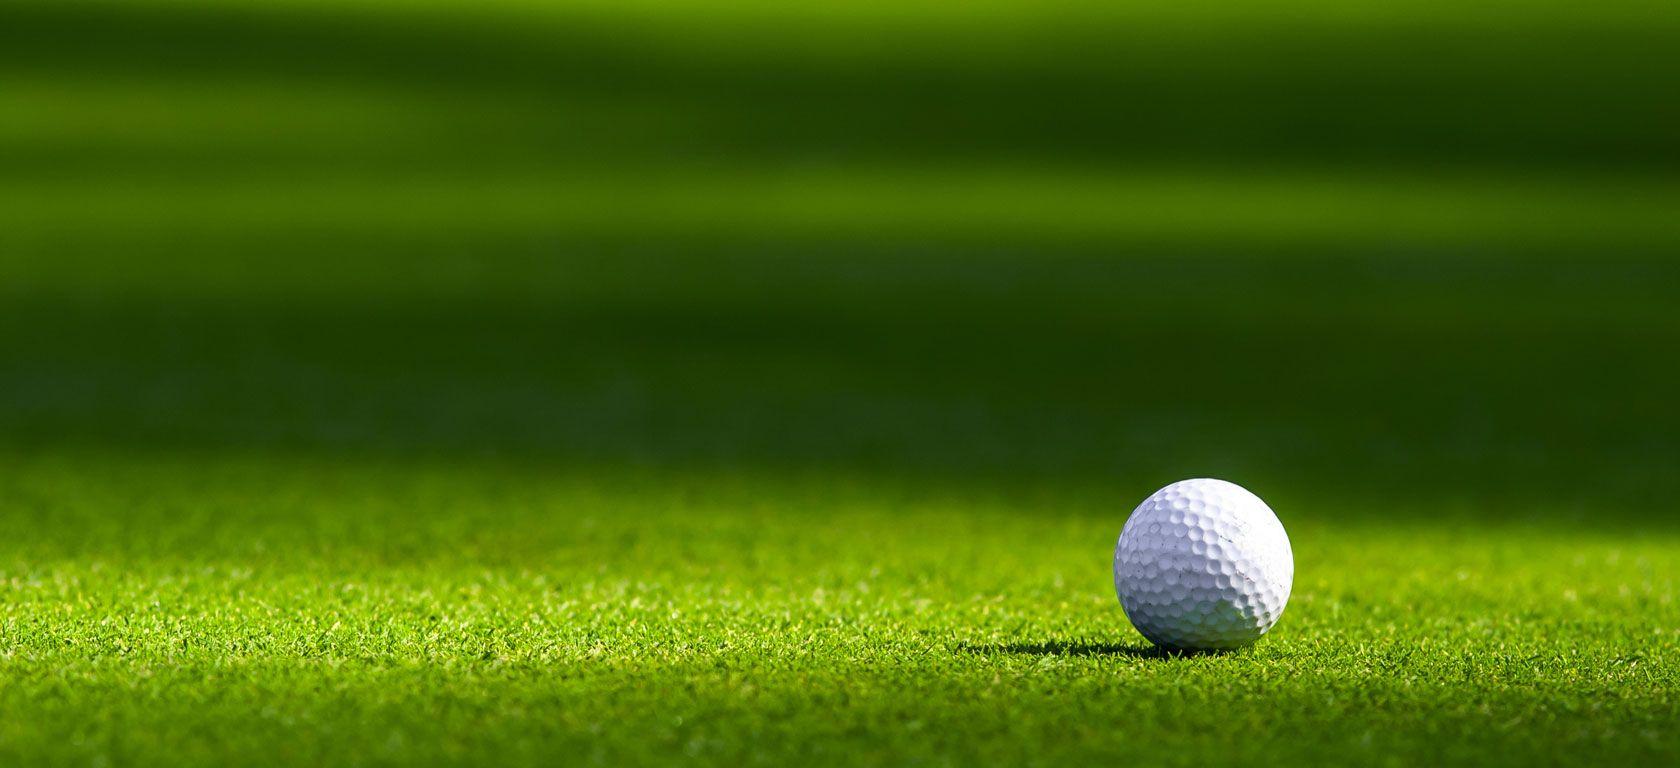 http://www.golfsbw.com/